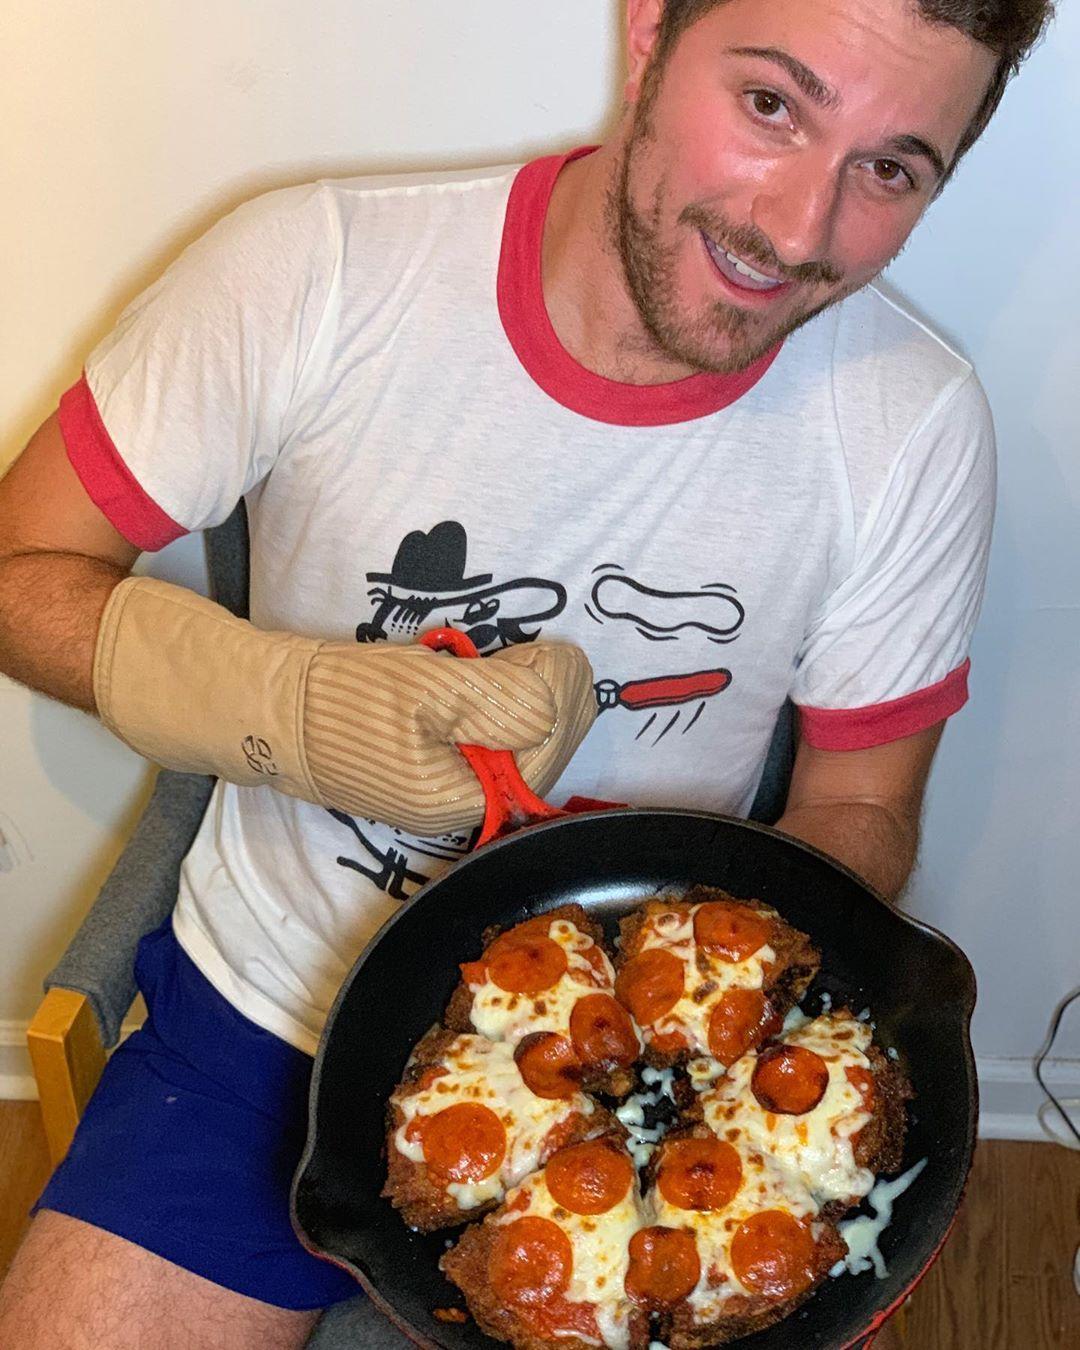 shay-pizzadilla-1-1566832636436.jpg